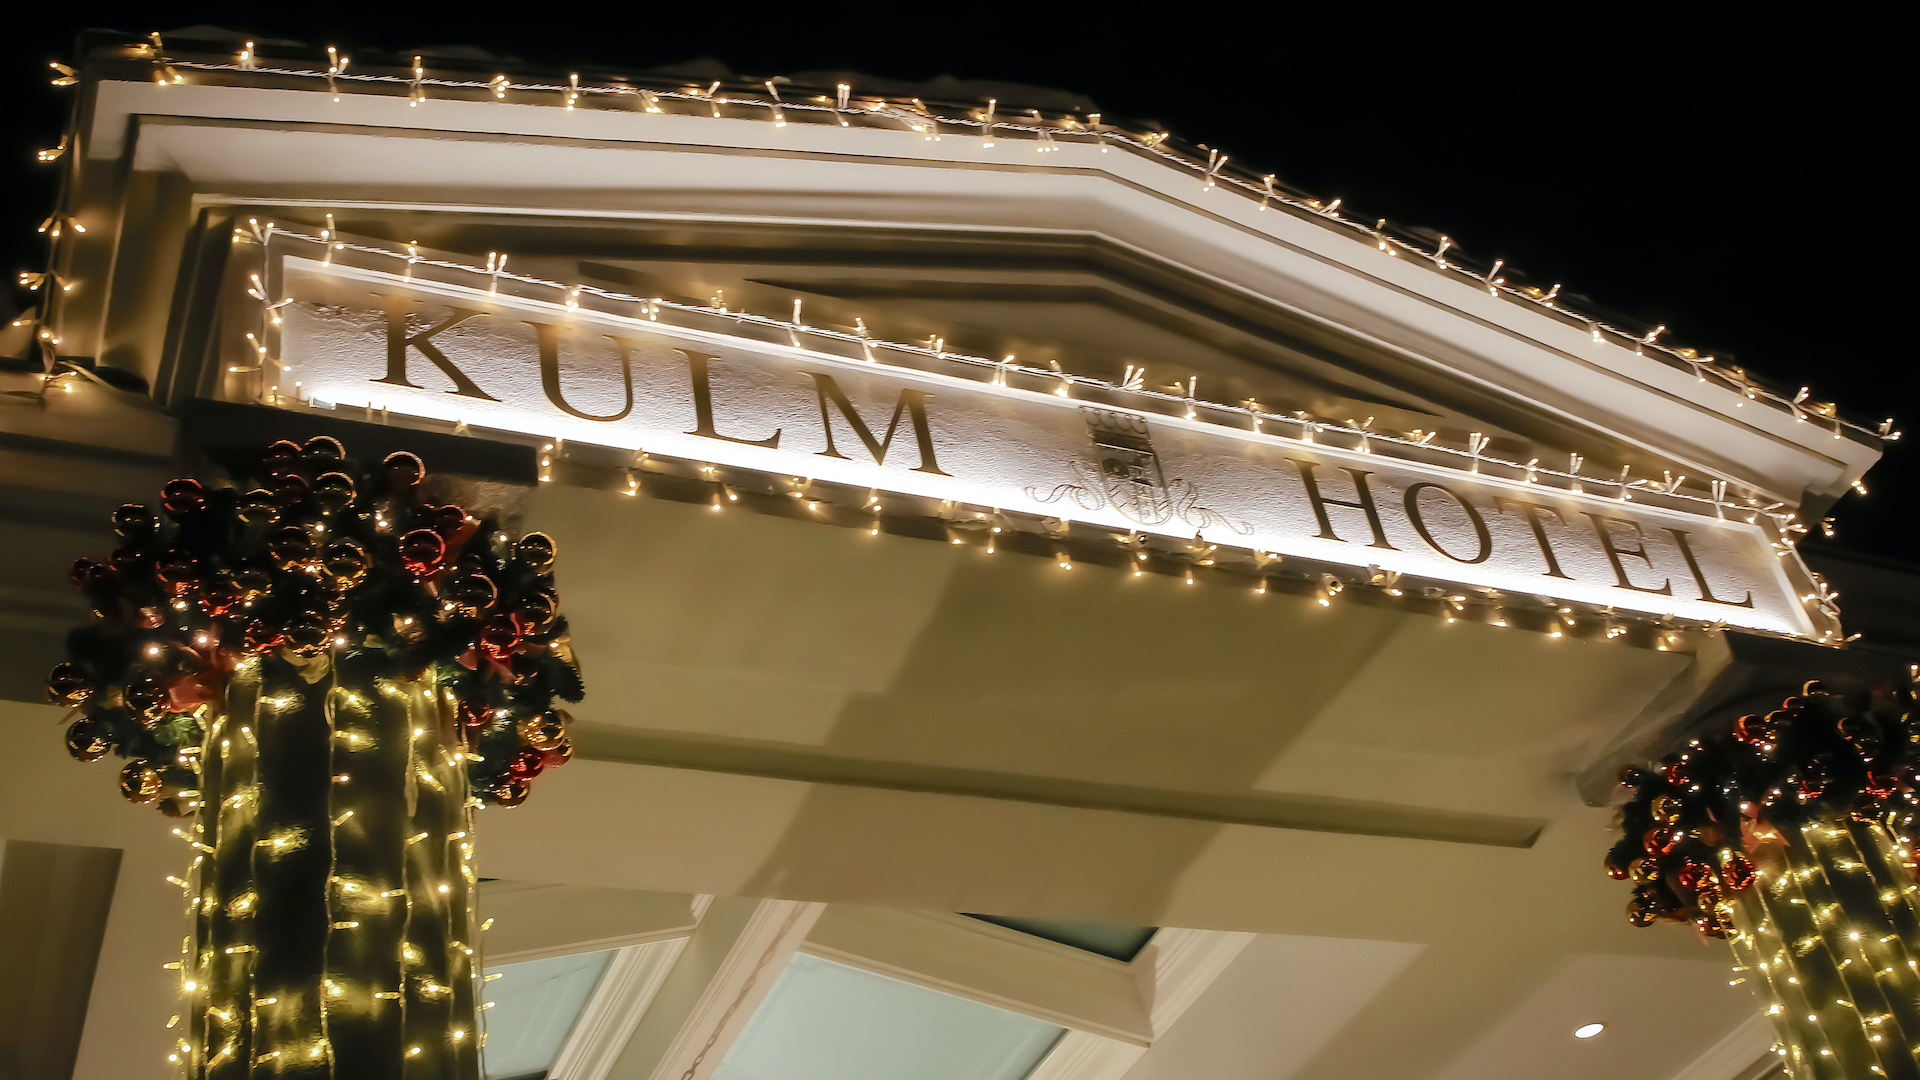 REVIEW The Kulm St. Moritz: uno de los mejores hoteles de Suiza